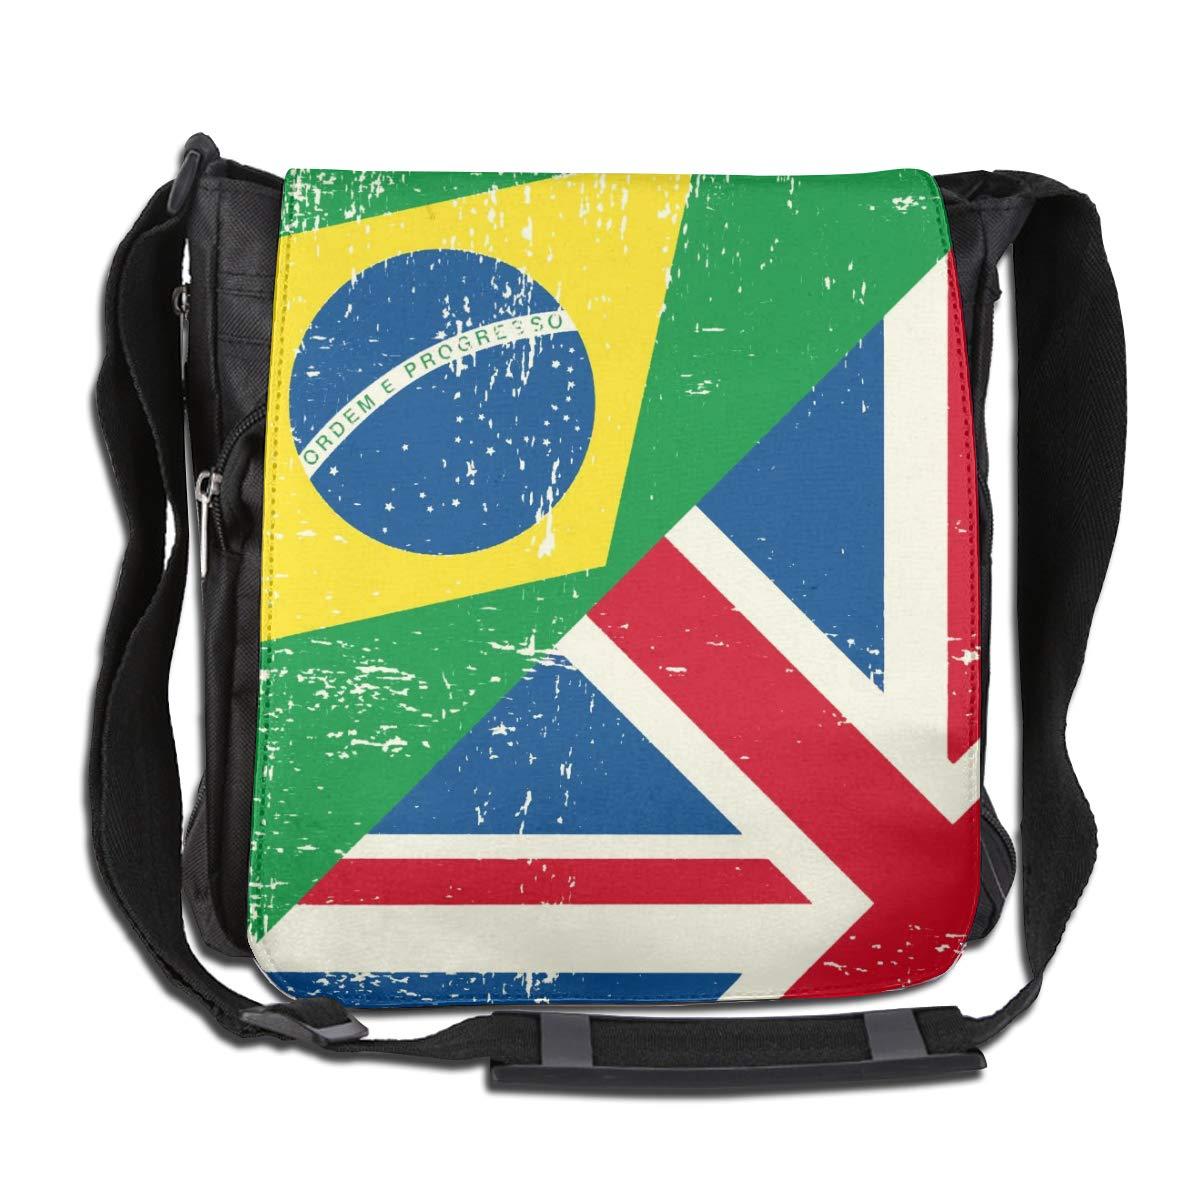 UK And Brazil Flag Crossbody Shoulder Bag Durable Casual Daily Messenger Bag Satchel School Bag For Women And Men